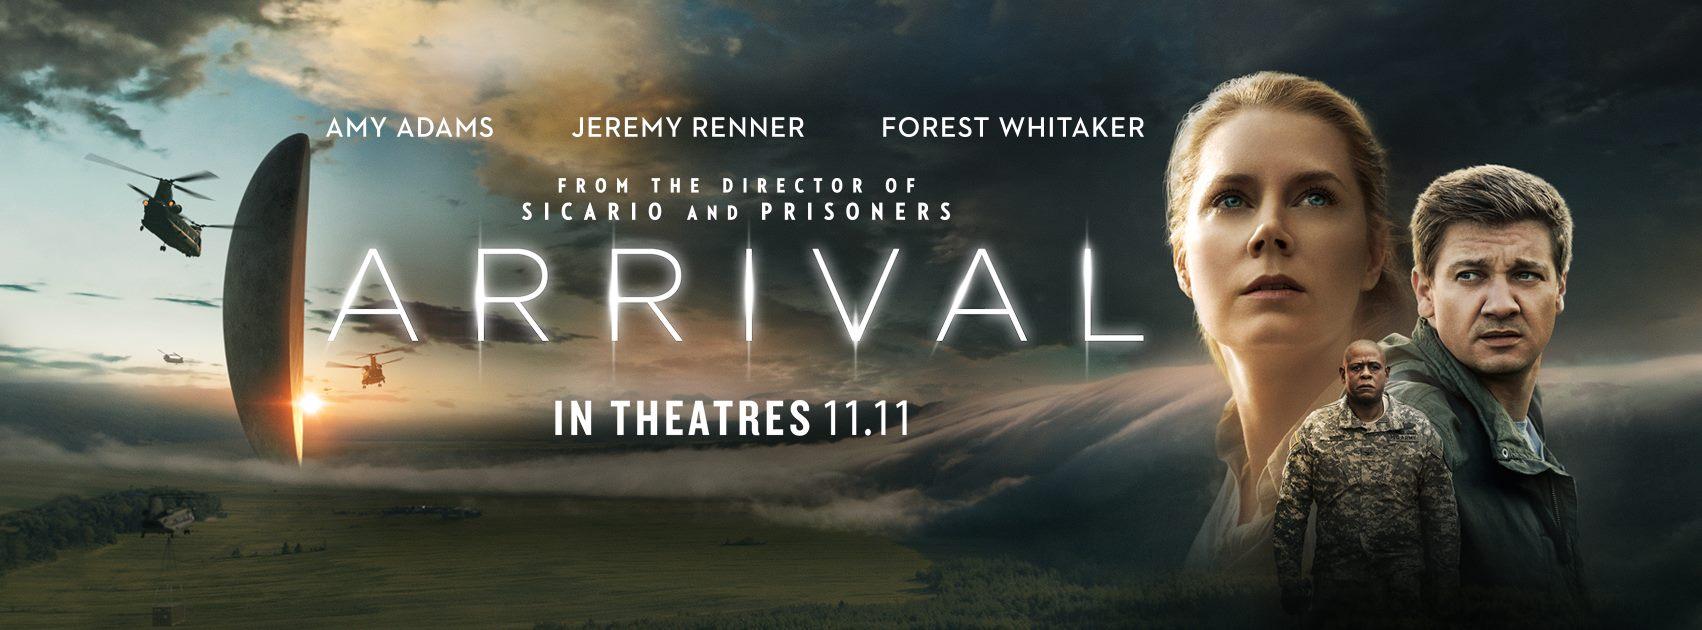 فیلم Arrival